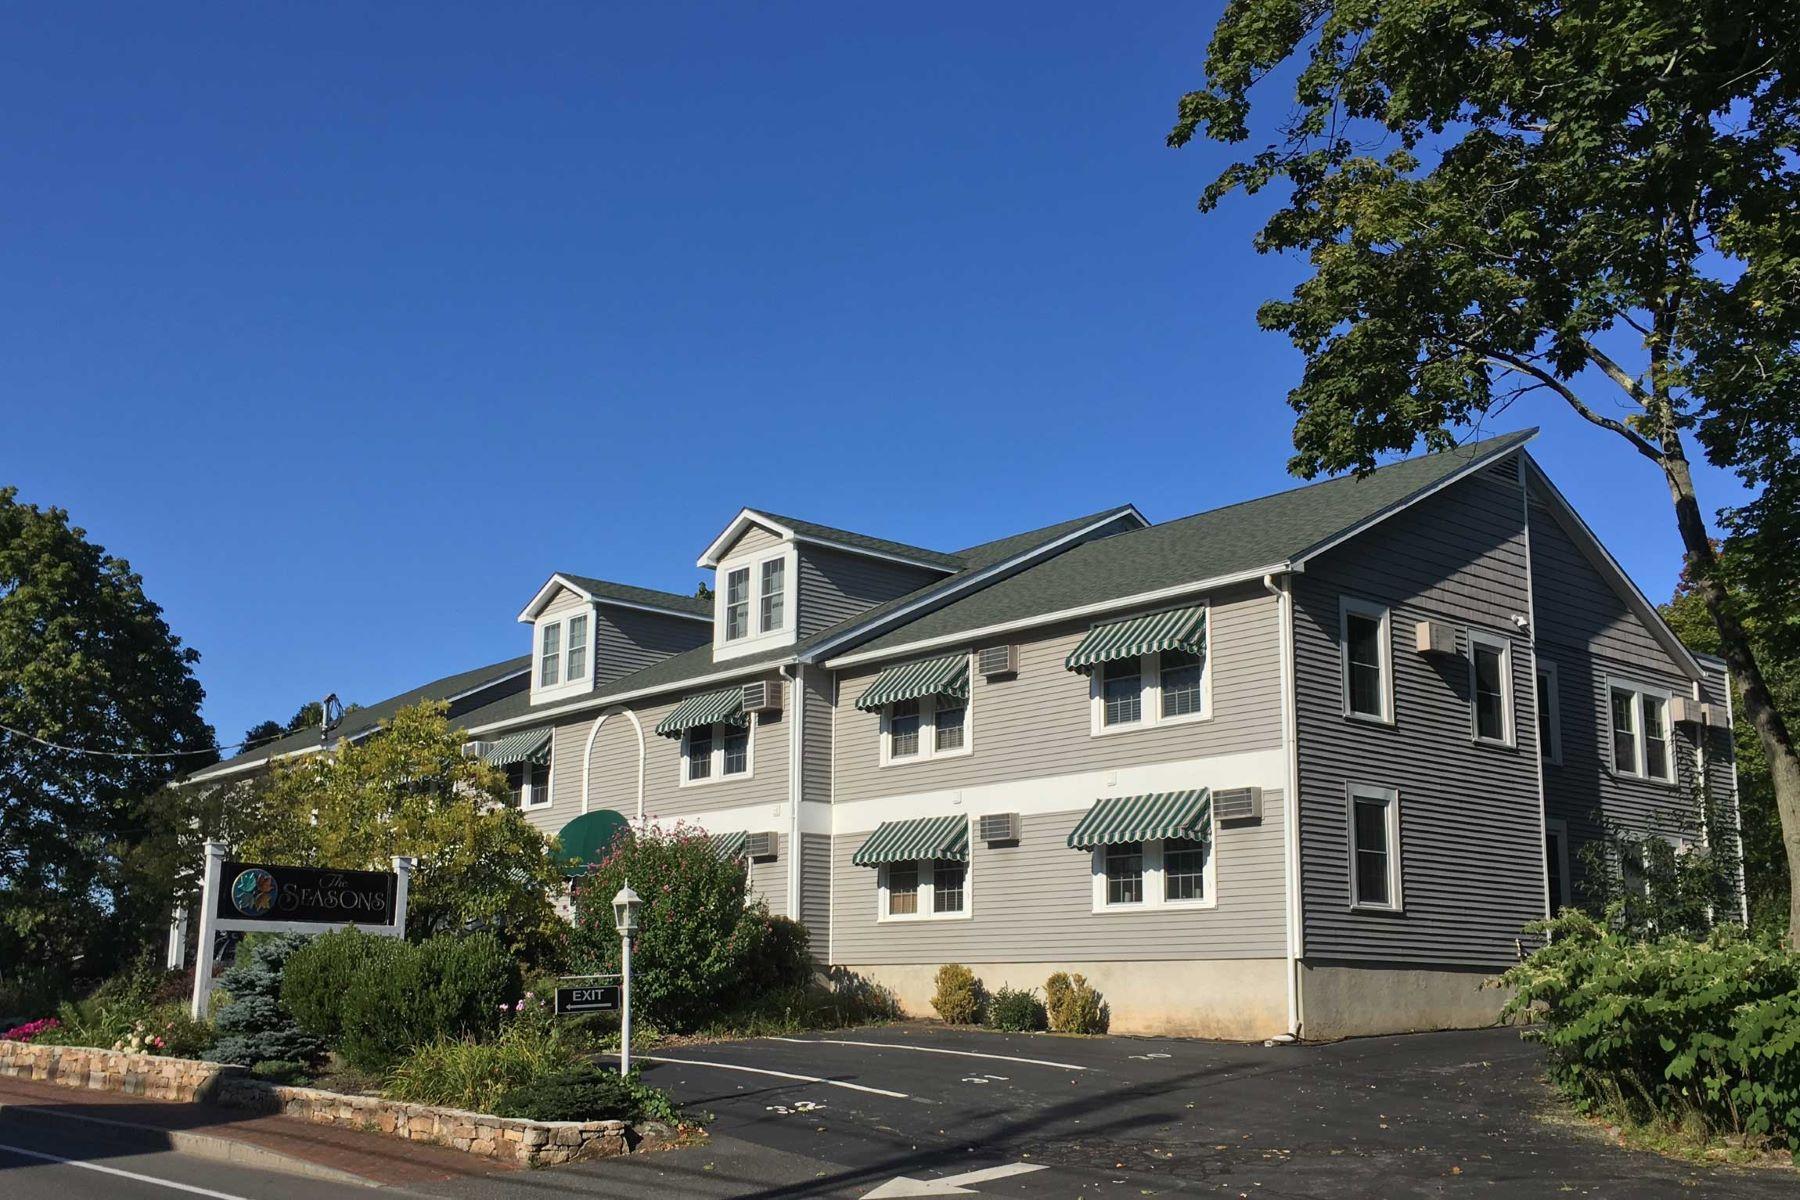 Condominiums for Sale at 1 Bedroom Condo in the Heart of Ogunquit Village 298 Main Street, Unit #202 Ogunquit, Maine 03907 United States